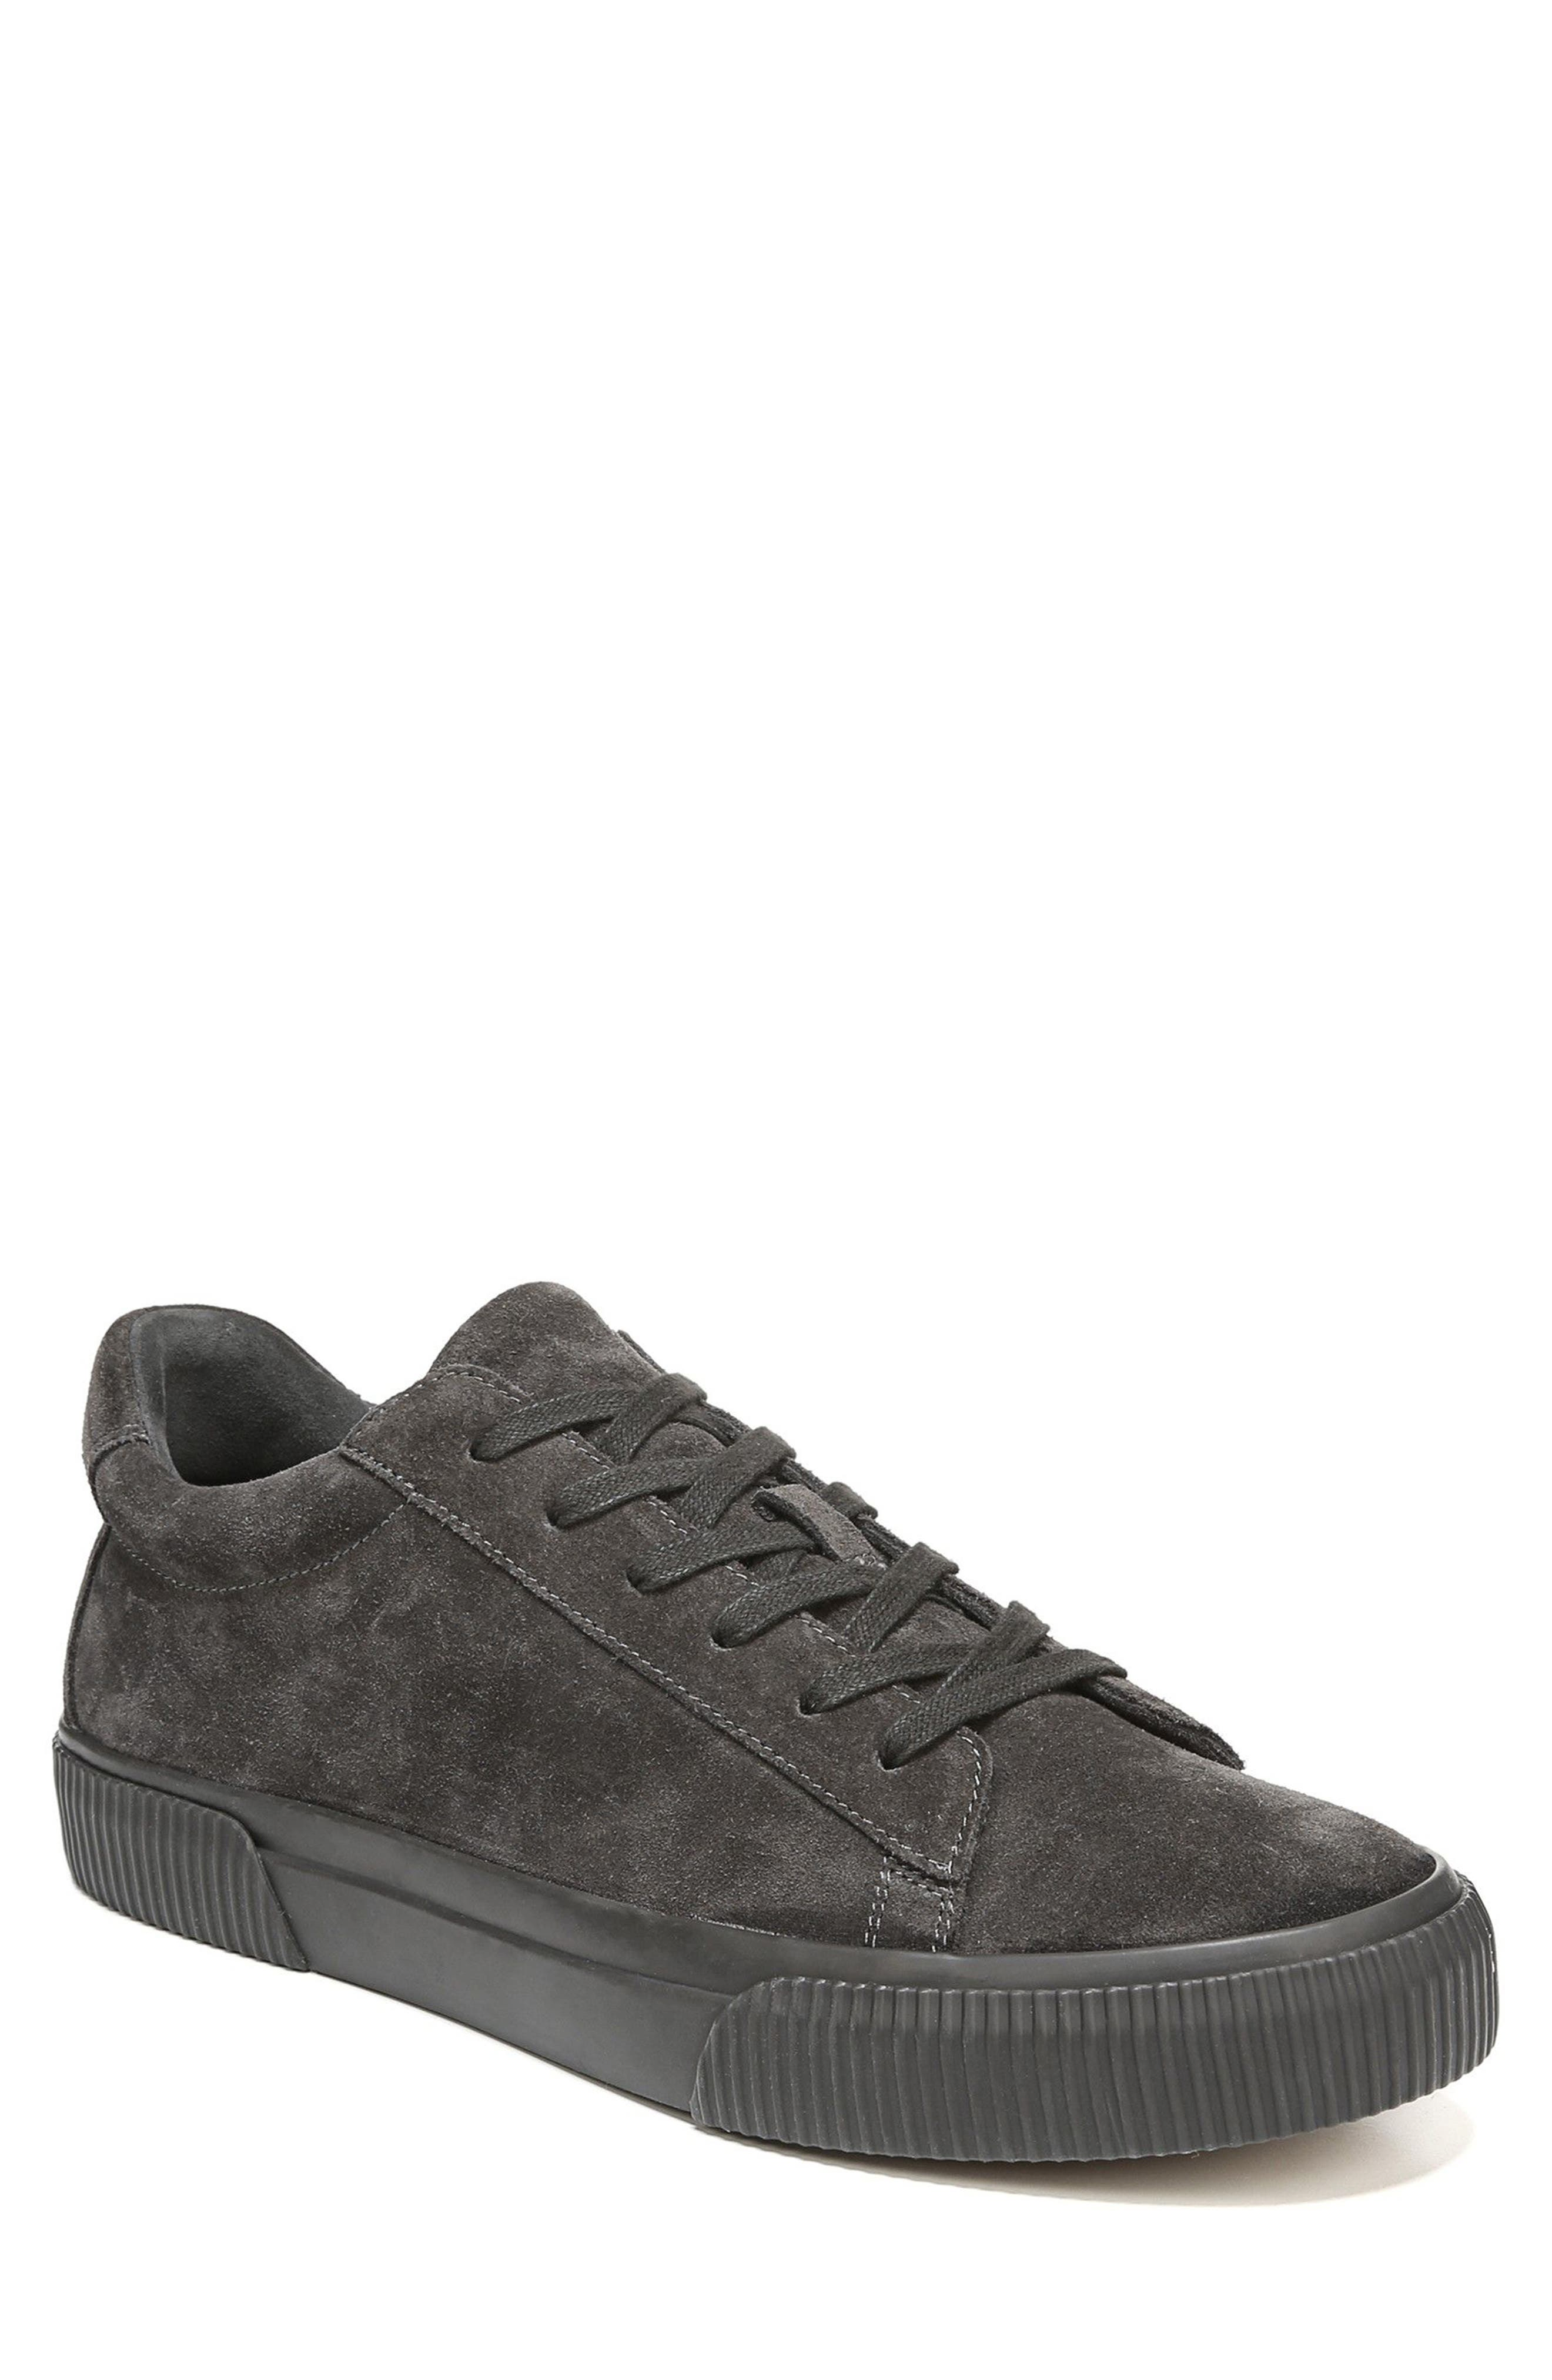 VINCE Kurtis Sneaker, Main, color, 020